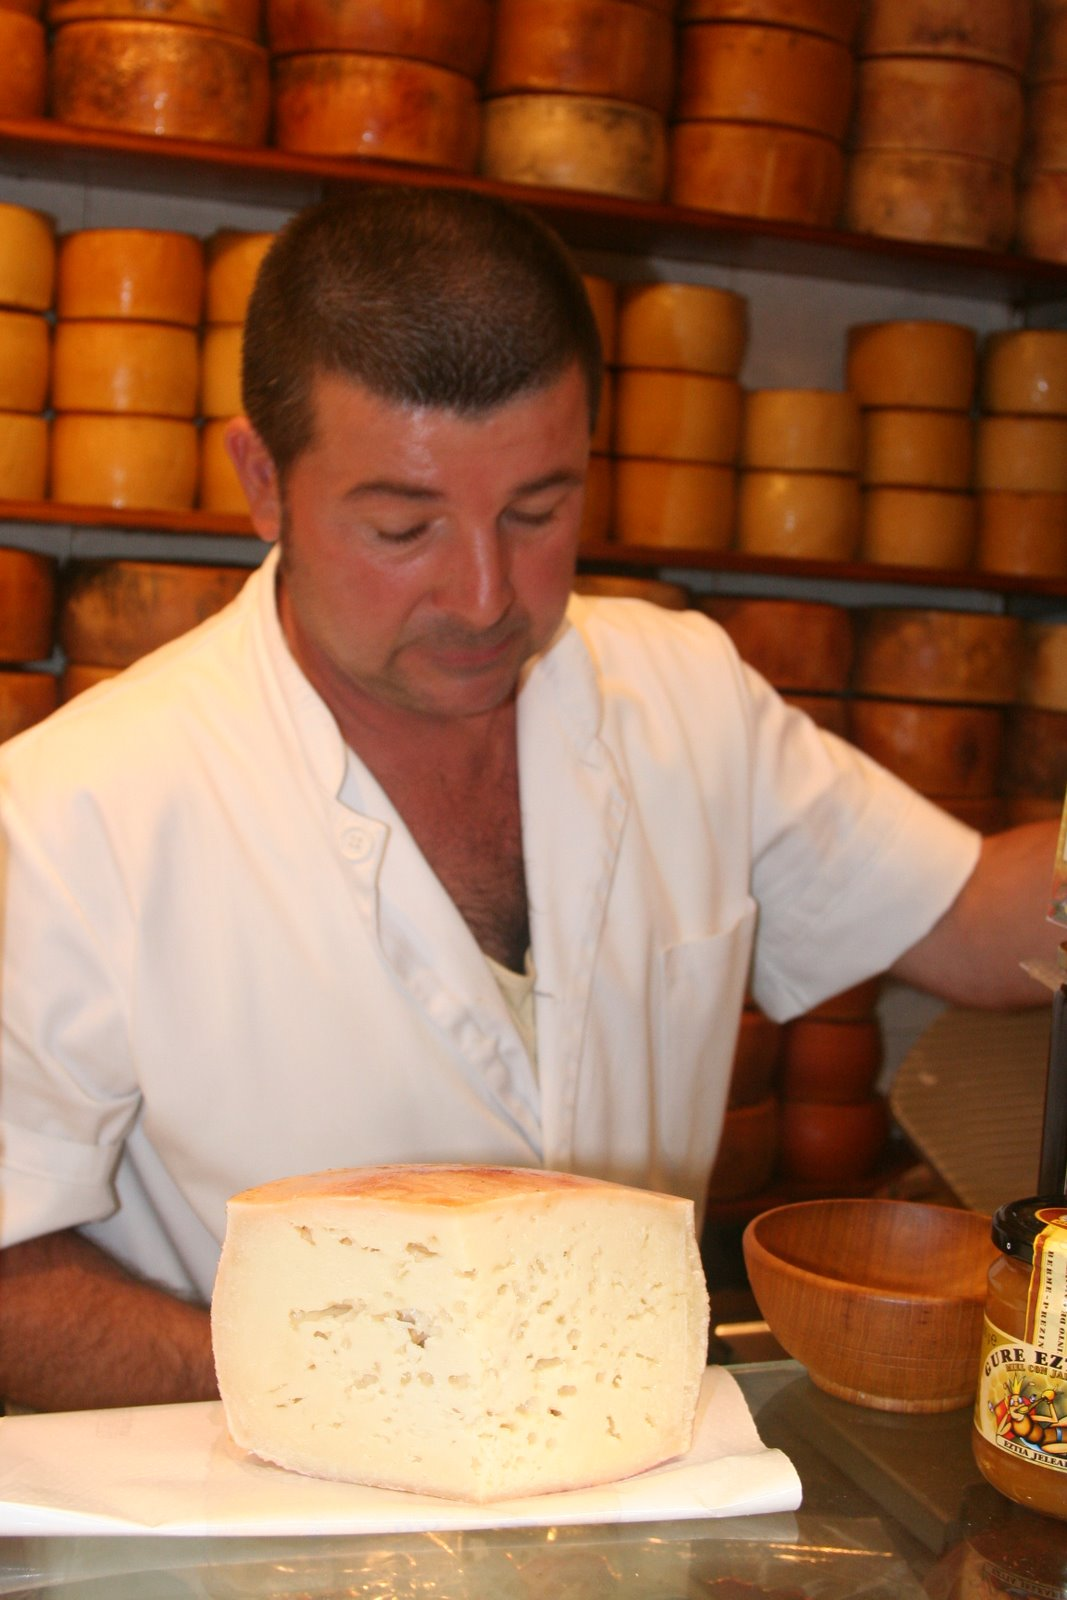 [Zarautz+market+Great+Idiazabal+cheese+IMG_7883.JPG]